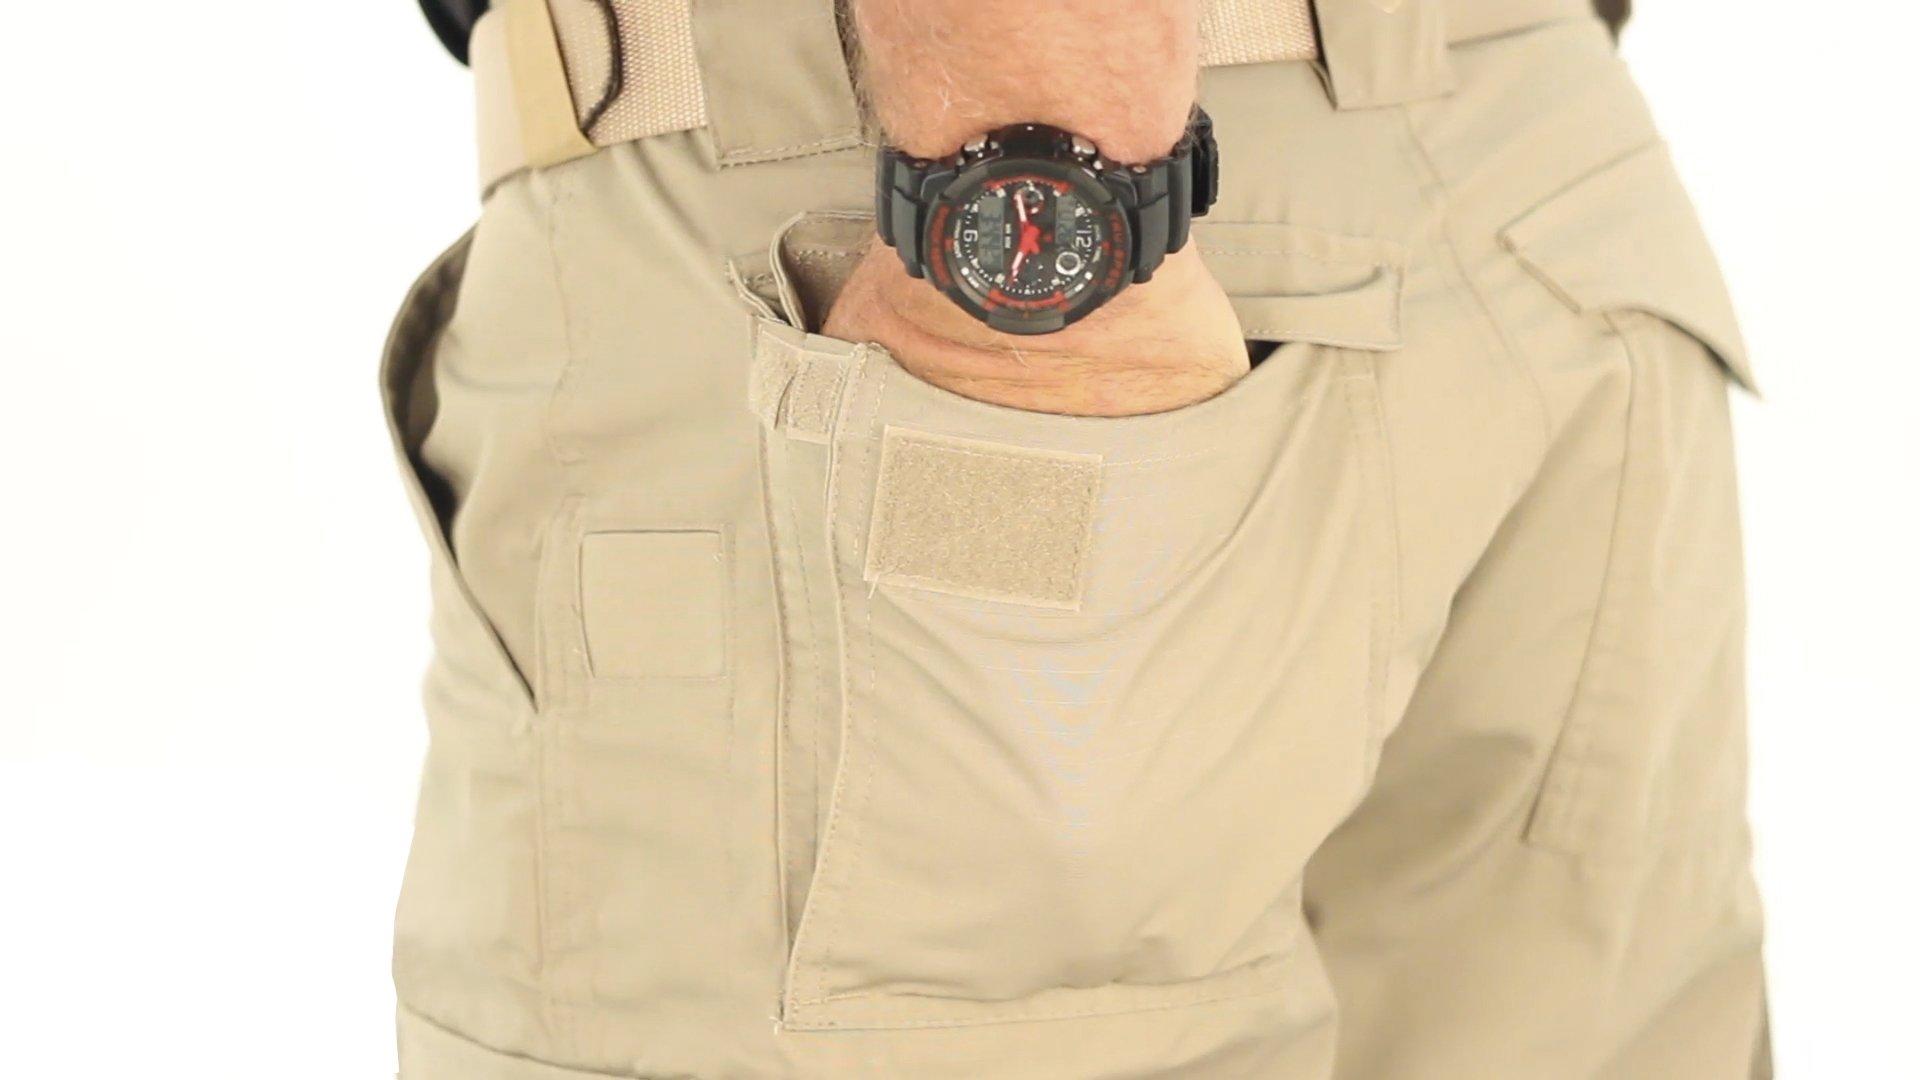 TRU-SPEC Men's 24-7 Tactical Pant, Coyote, 32 x 32-Inch by Tru-Spec (Image #3)